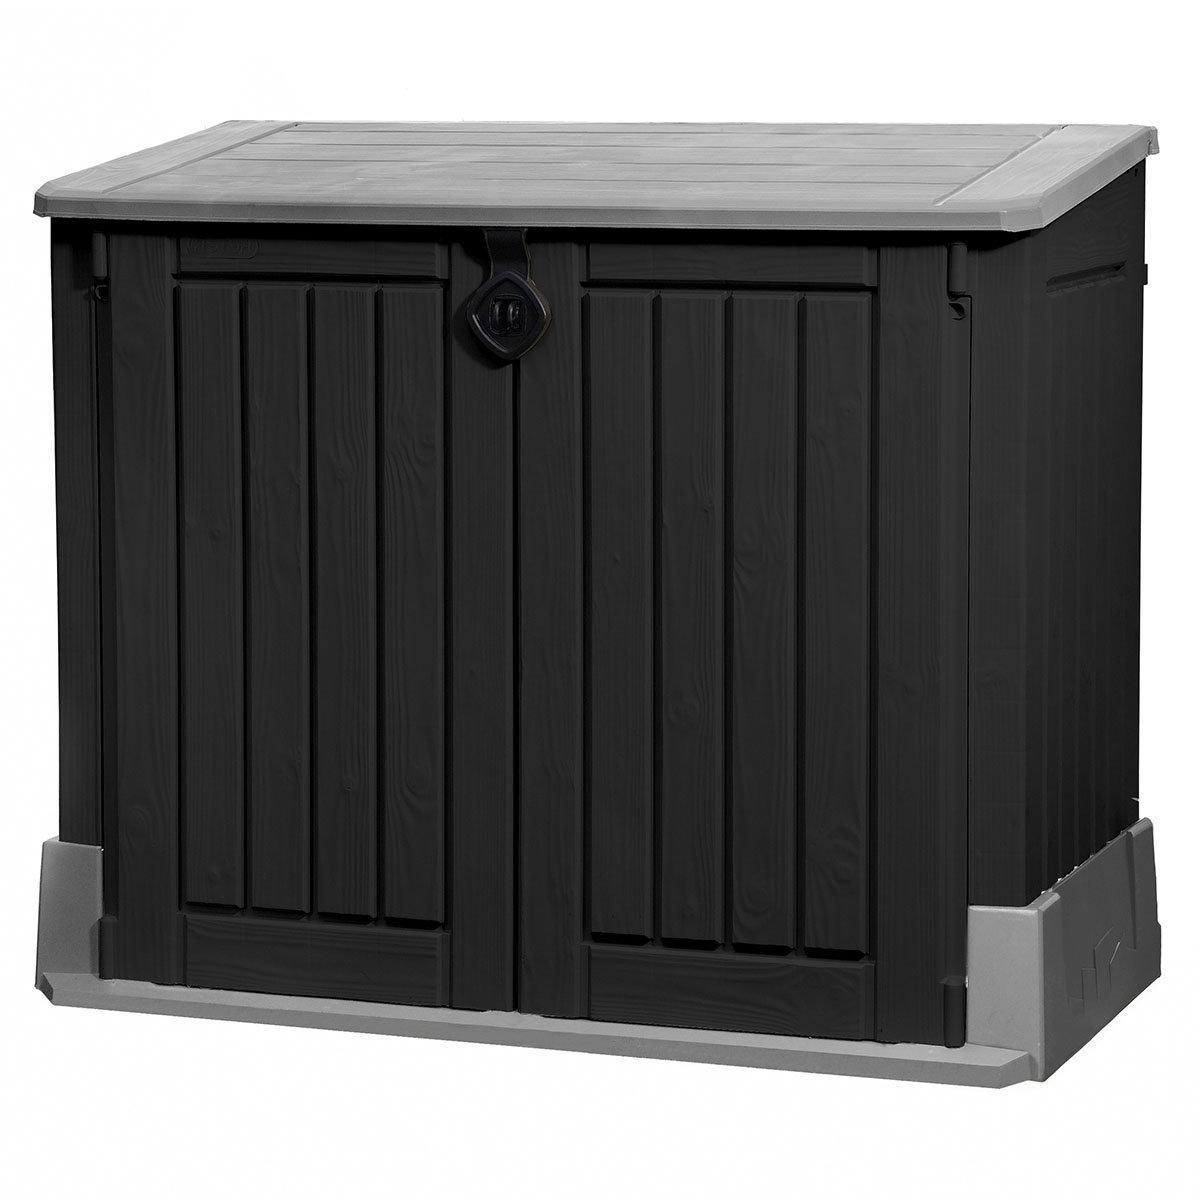 Store It Out Midi Aufbewahrungsbox Woodland 845 L, schwarz-grau